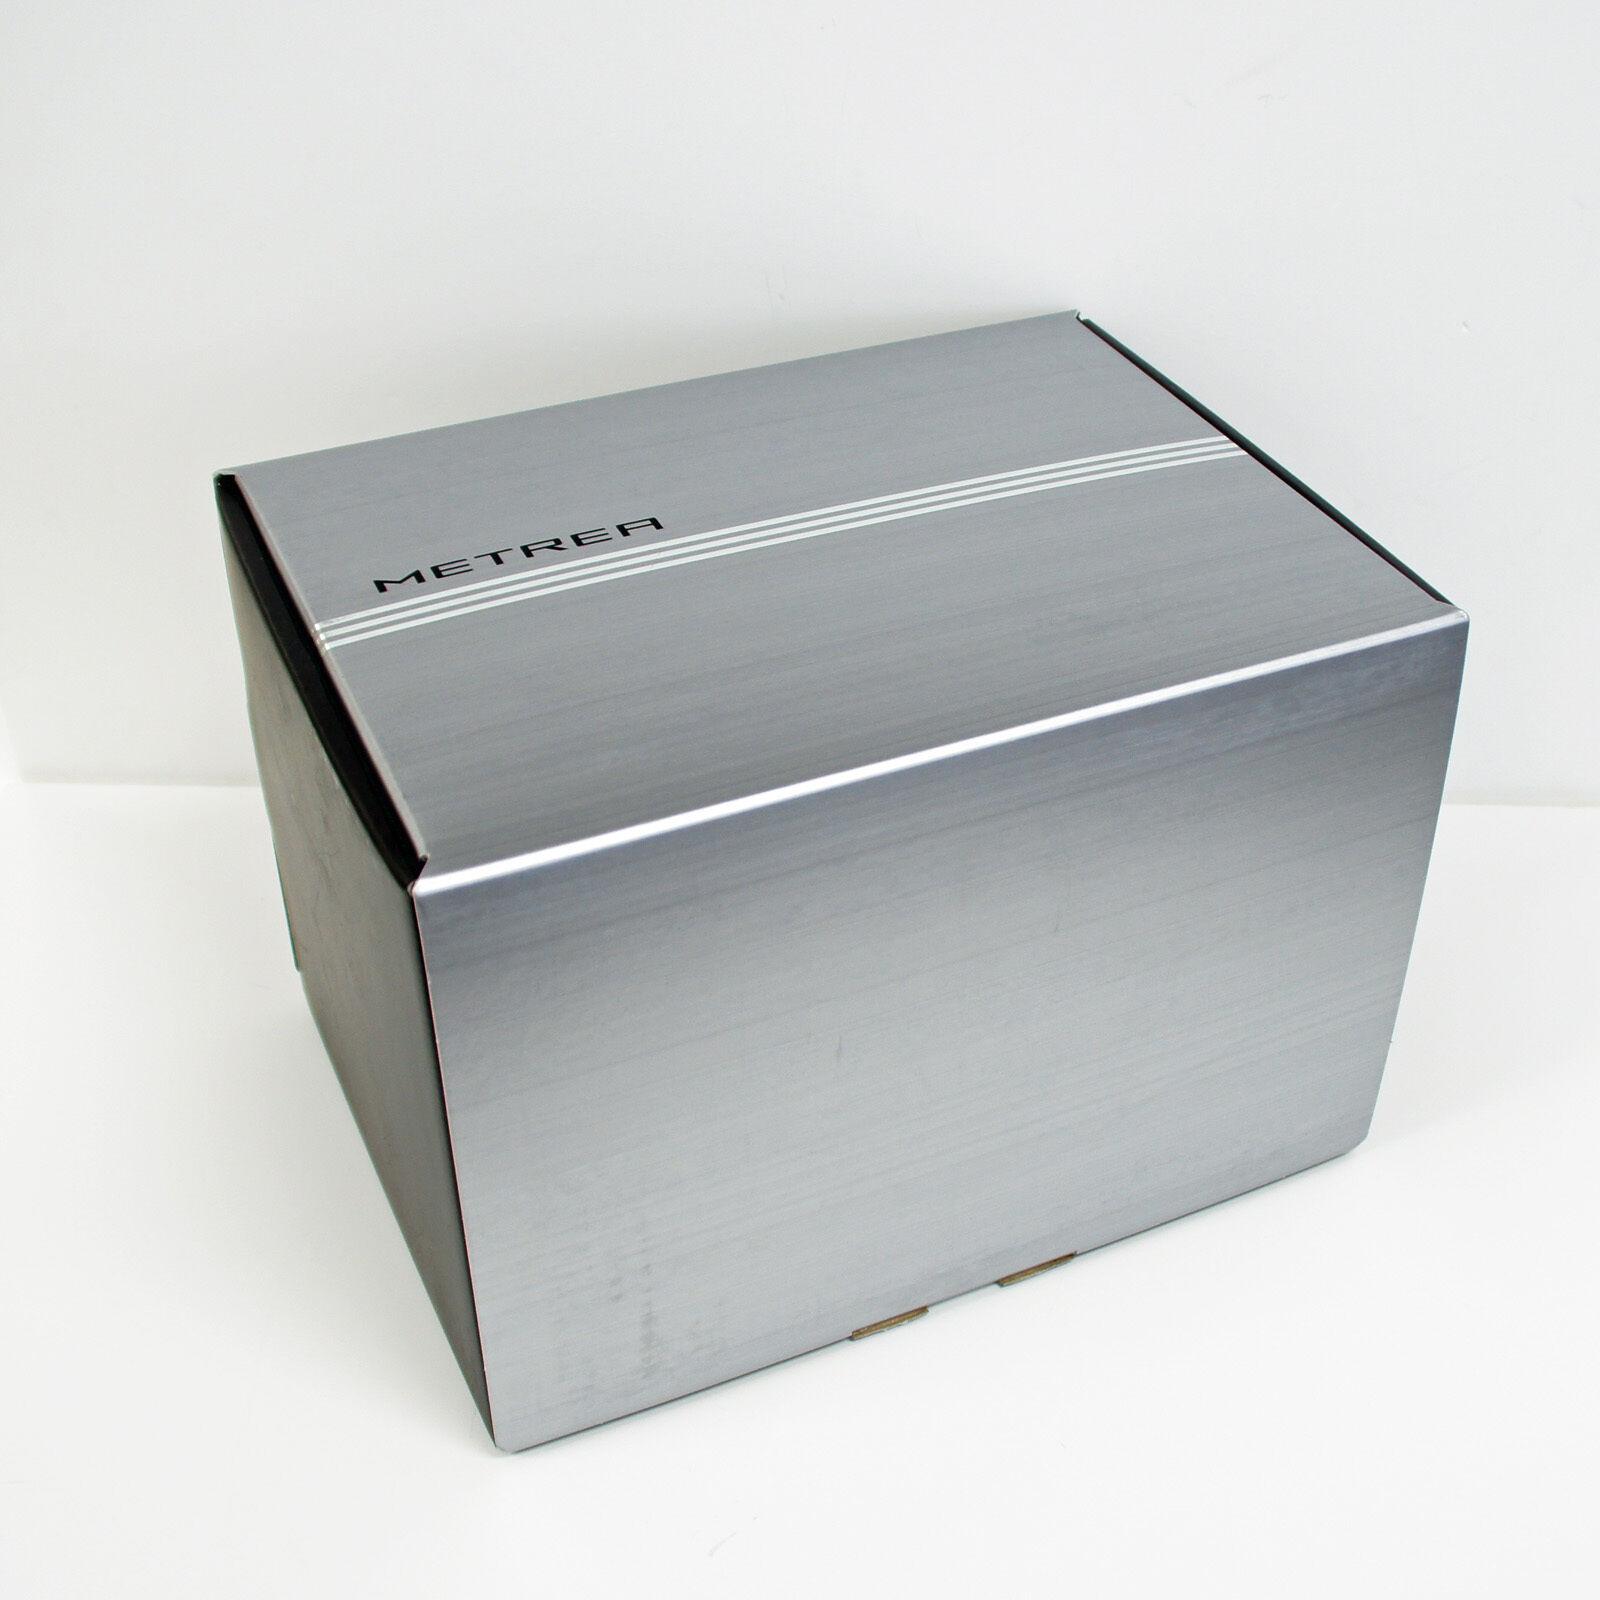 Shimano metrea fc-u5000-1 42t 175mm 11-Speed manivela conjunto IFCU 5000exb2c